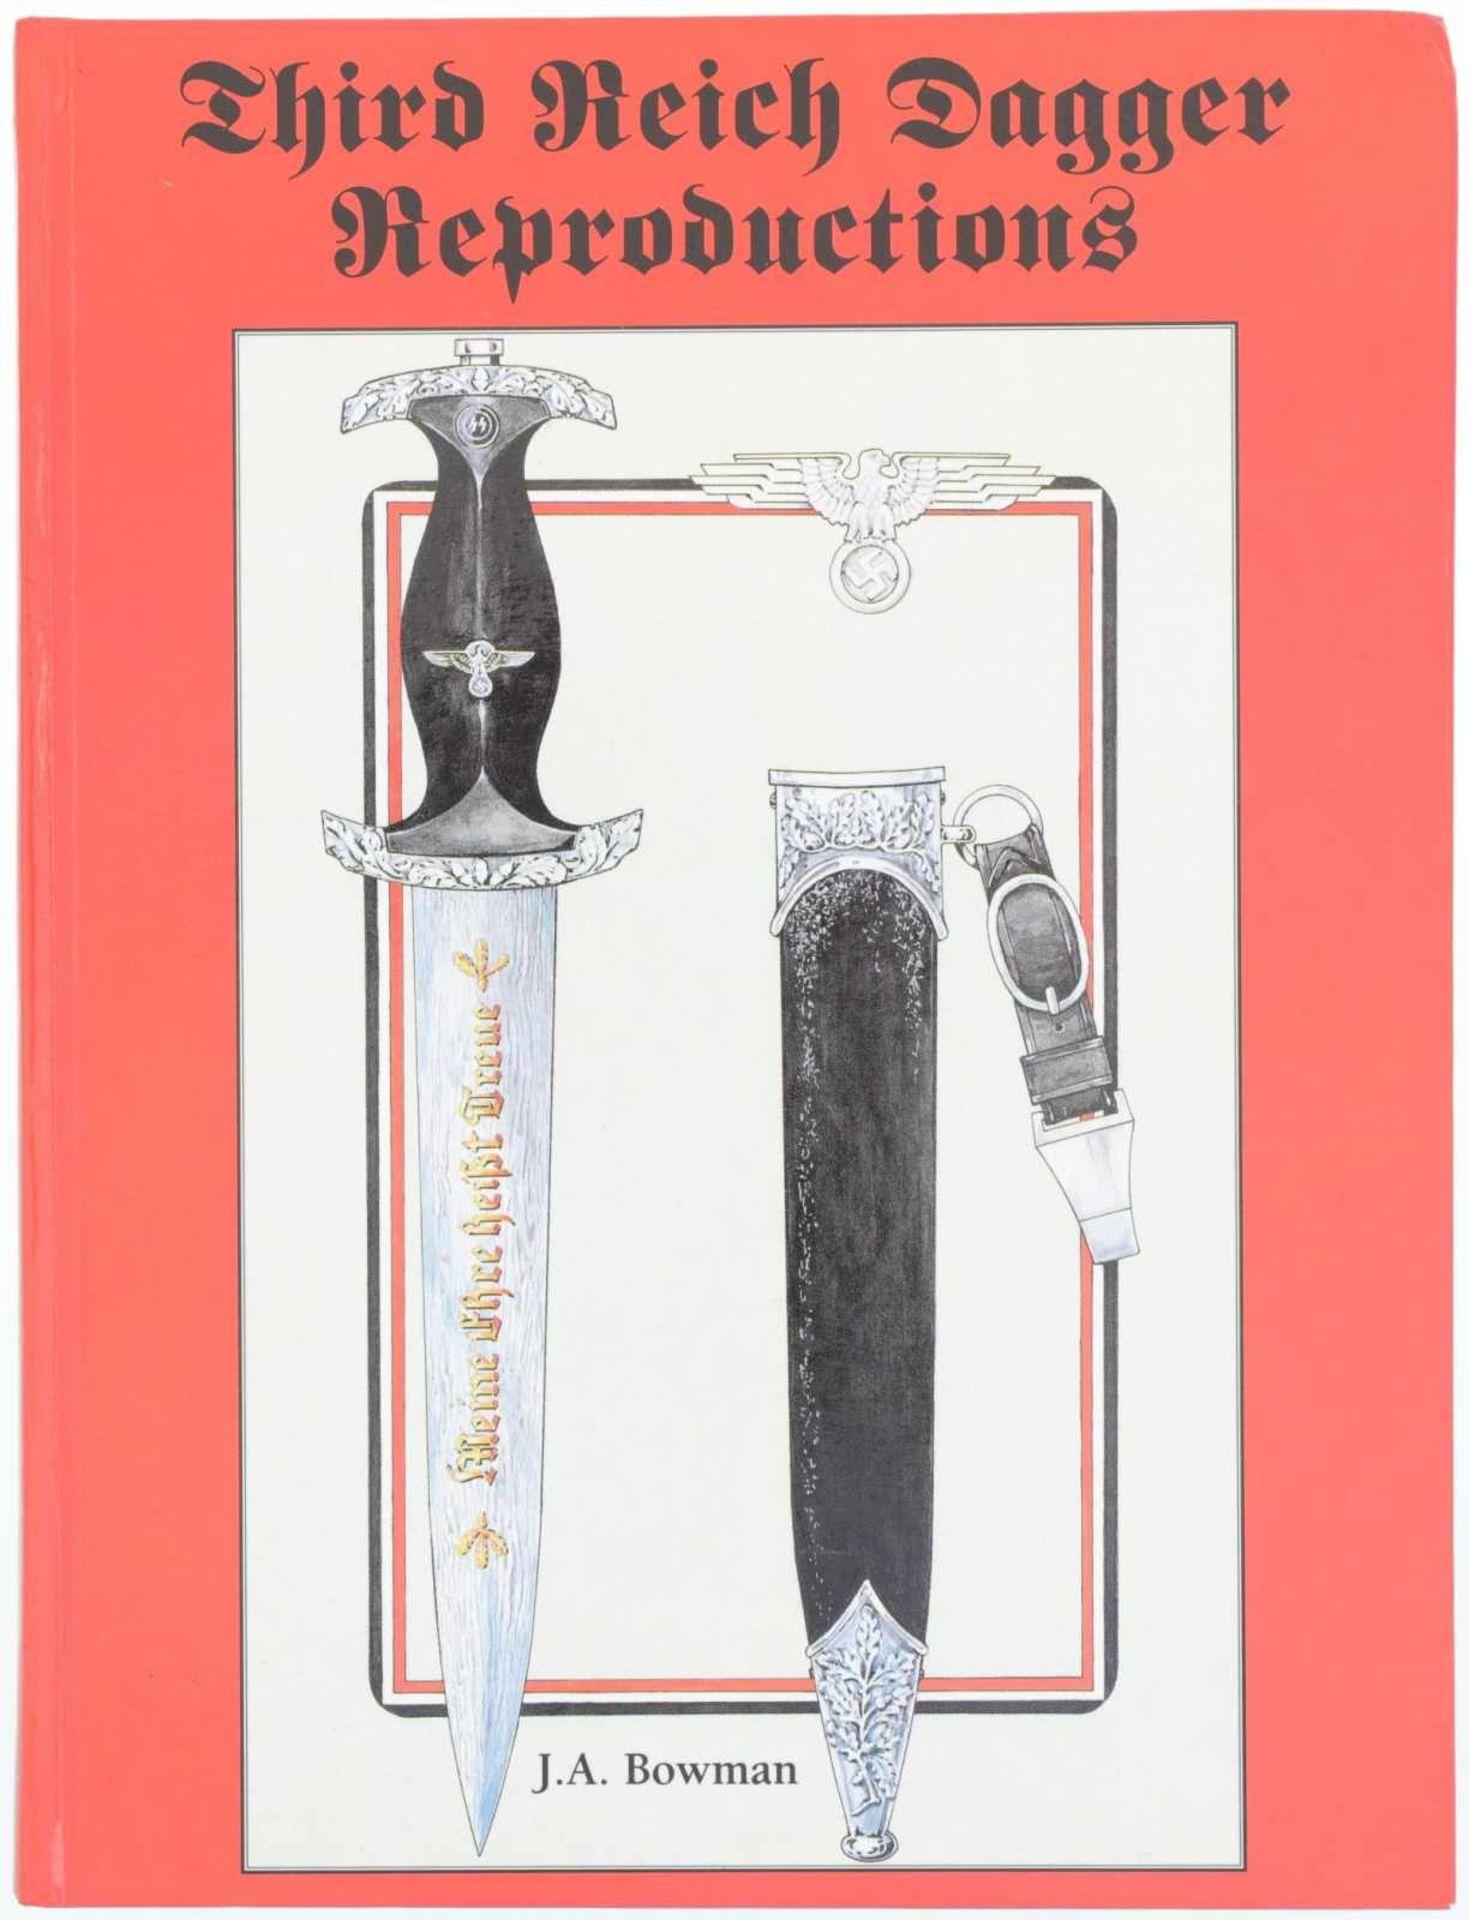 Third Reich Dagger Reproductions@ Verfasser J.A. Bowman, Lancaster 1993, 216 S. illust. Werk zur